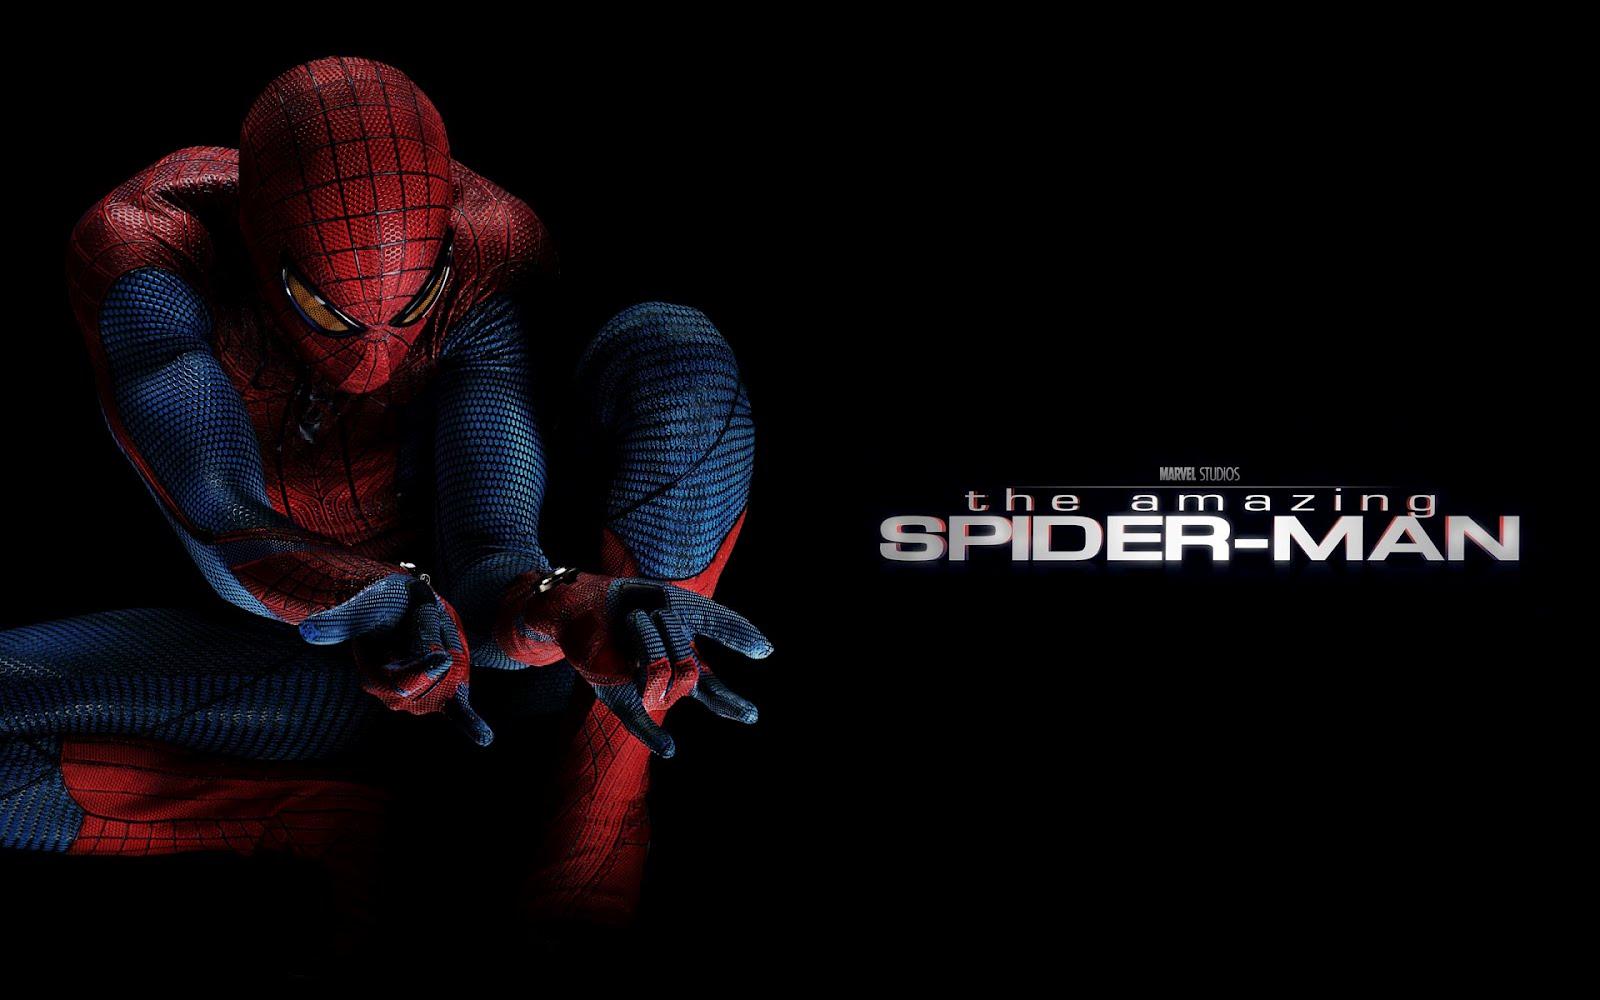 http://3.bp.blogspot.com/-mWp8C28LvcY/Ty-Lf-IO_AI/AAAAAAAAAi8/O5olV_ZnZ_0/s1600/Super-Hero-Movie-The-Amazing-Spider-Man-2012-Hd-Wallpaper.jpg